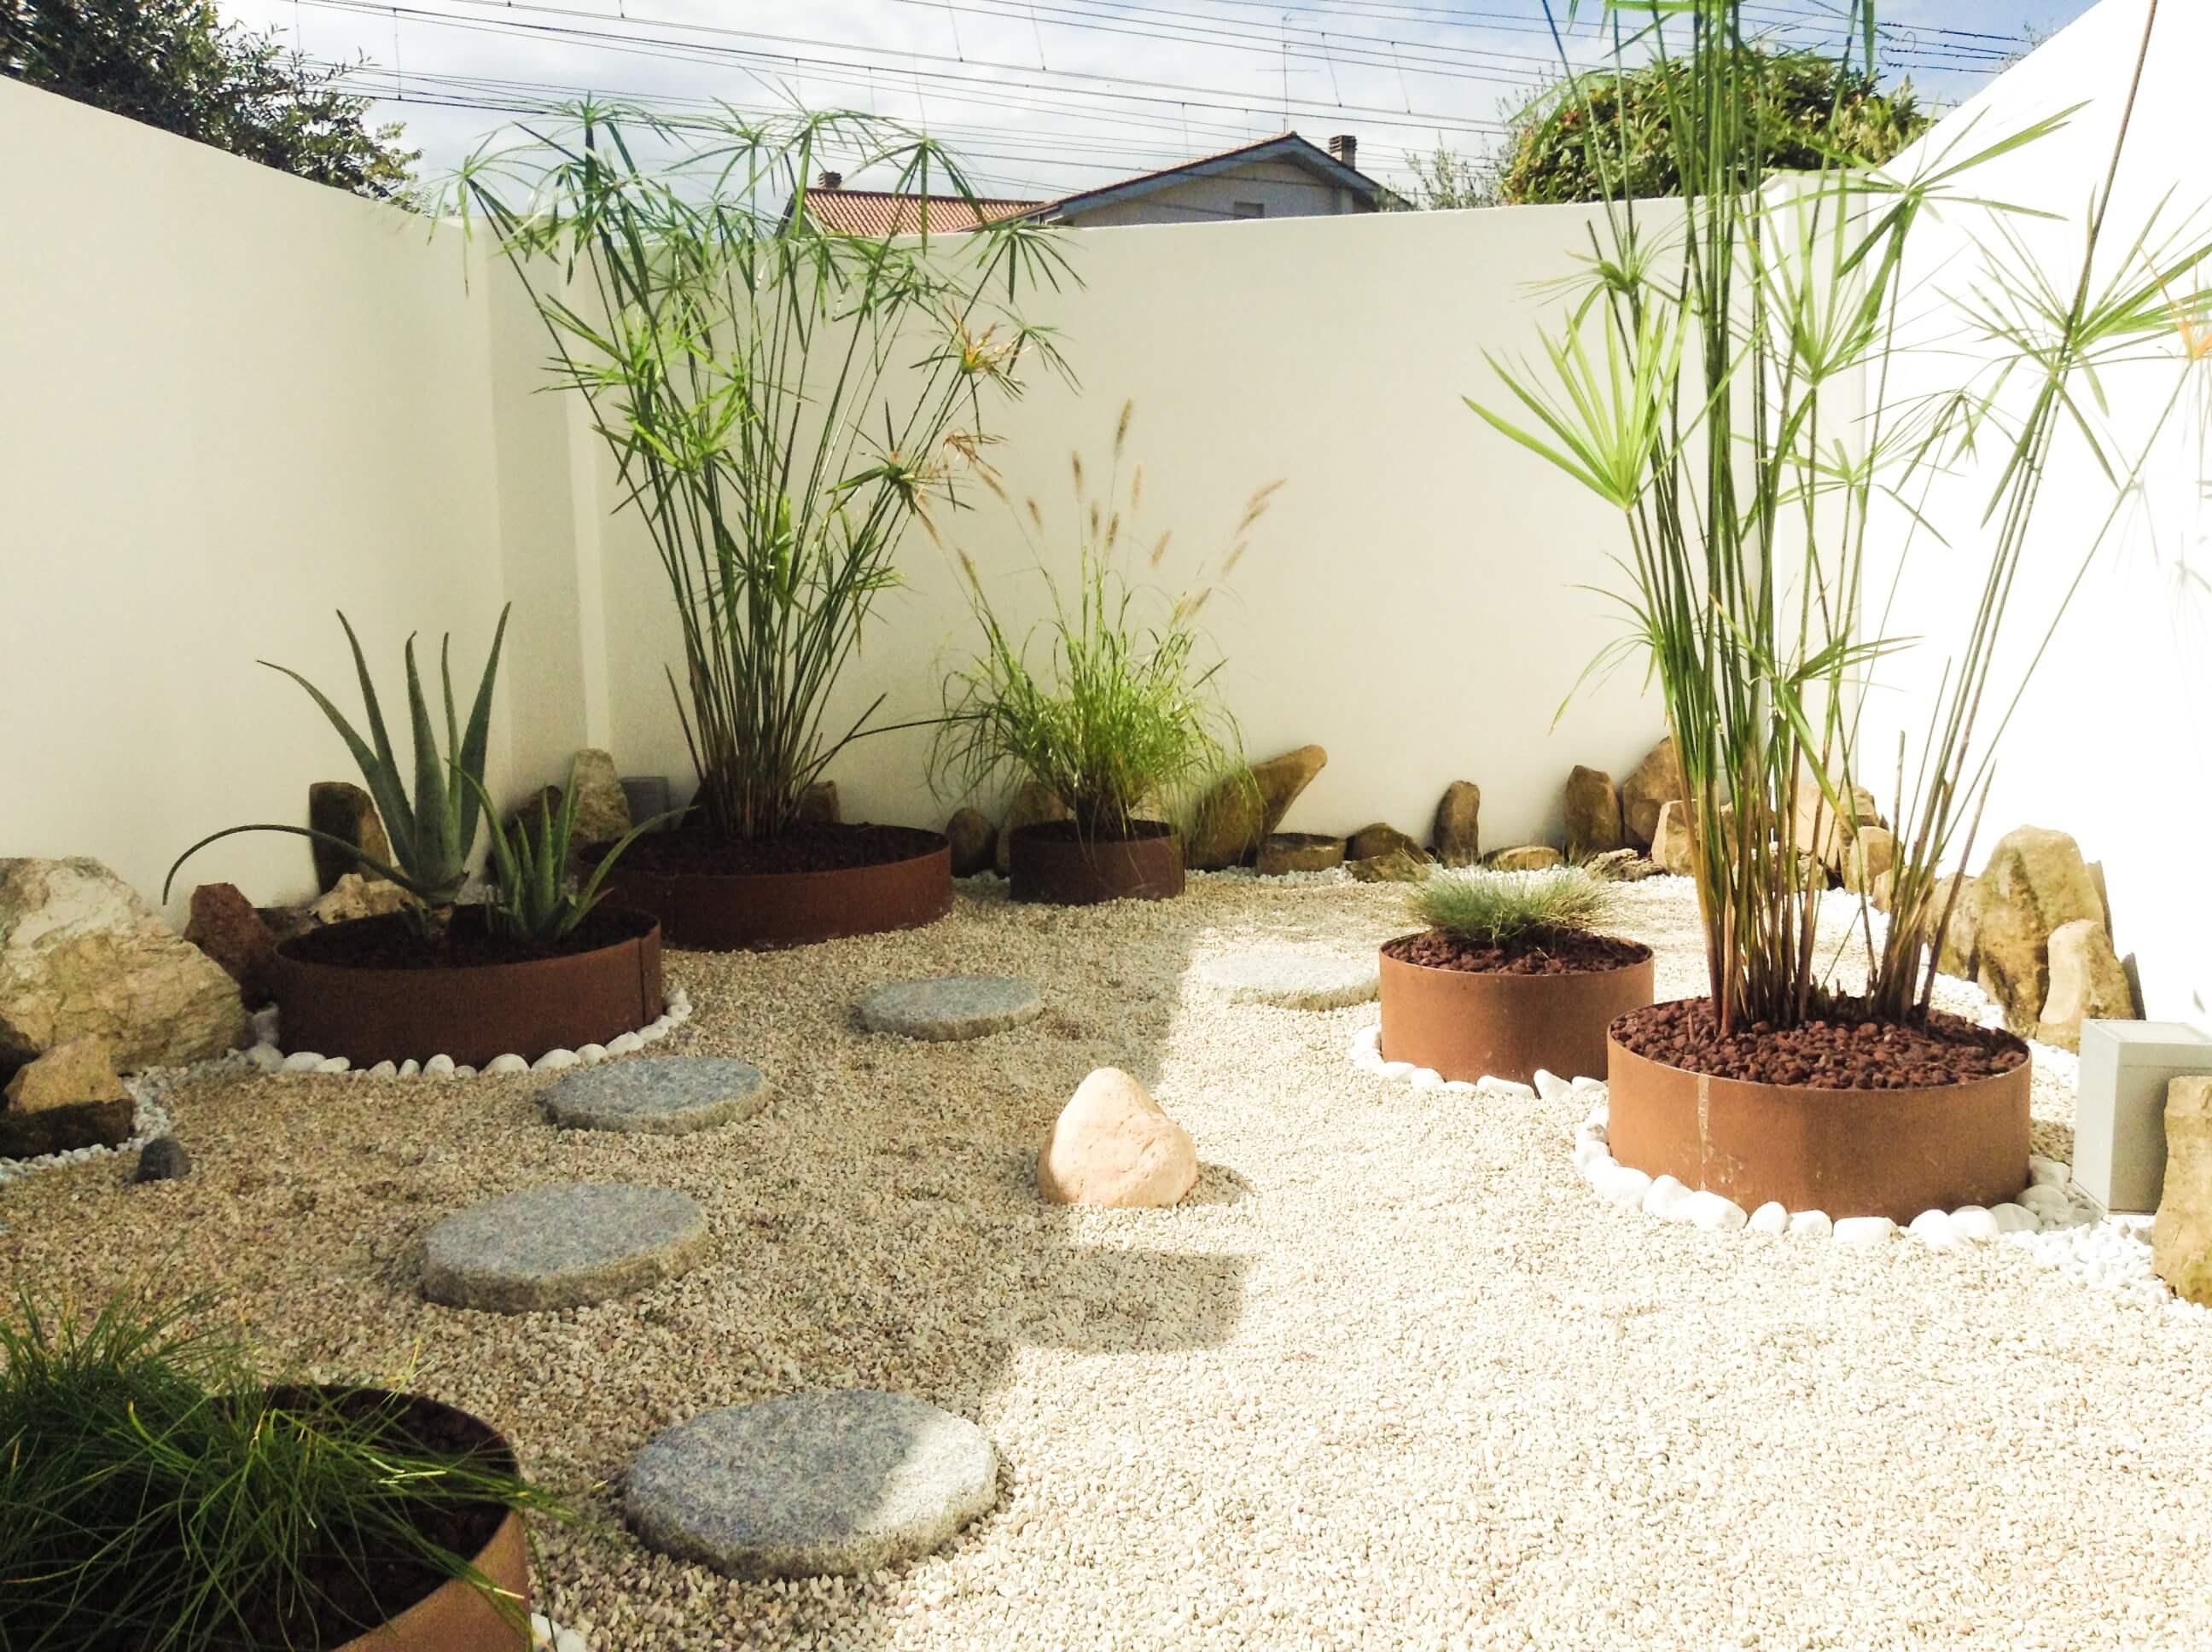 bordure-giardino-nutribel-zen-garden